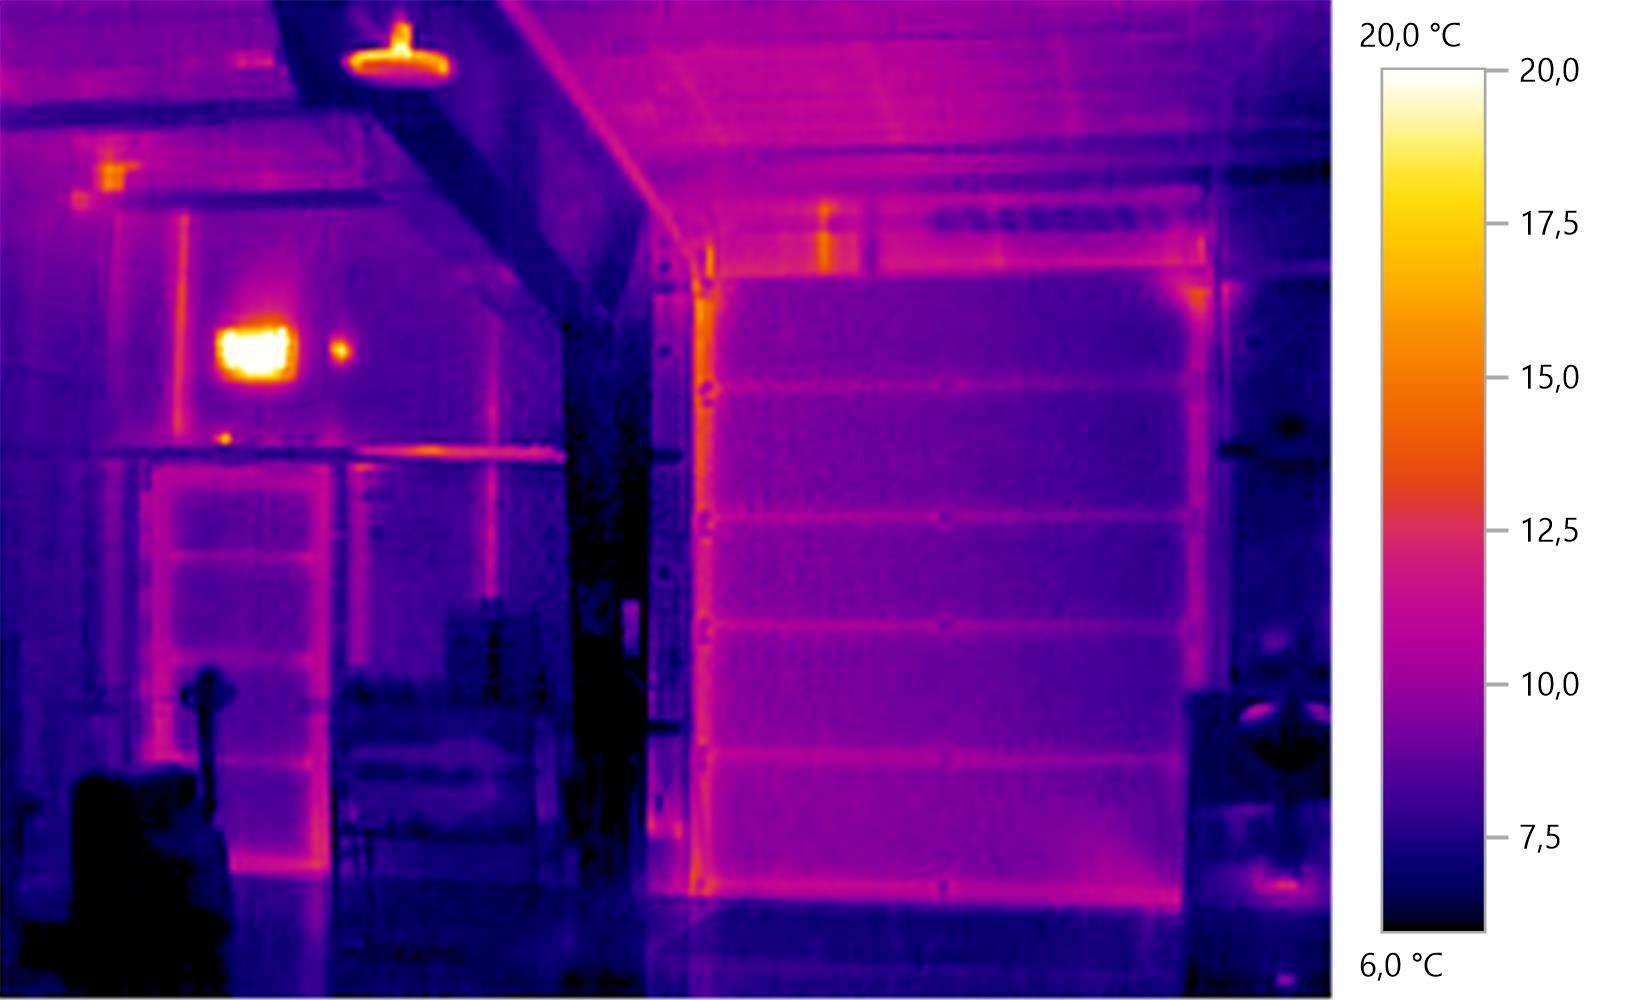 Referenz_Blower-Door-Test_Produktionshalle_Neuburg_Donau_Waermebild_Kuehlhalle.jpg